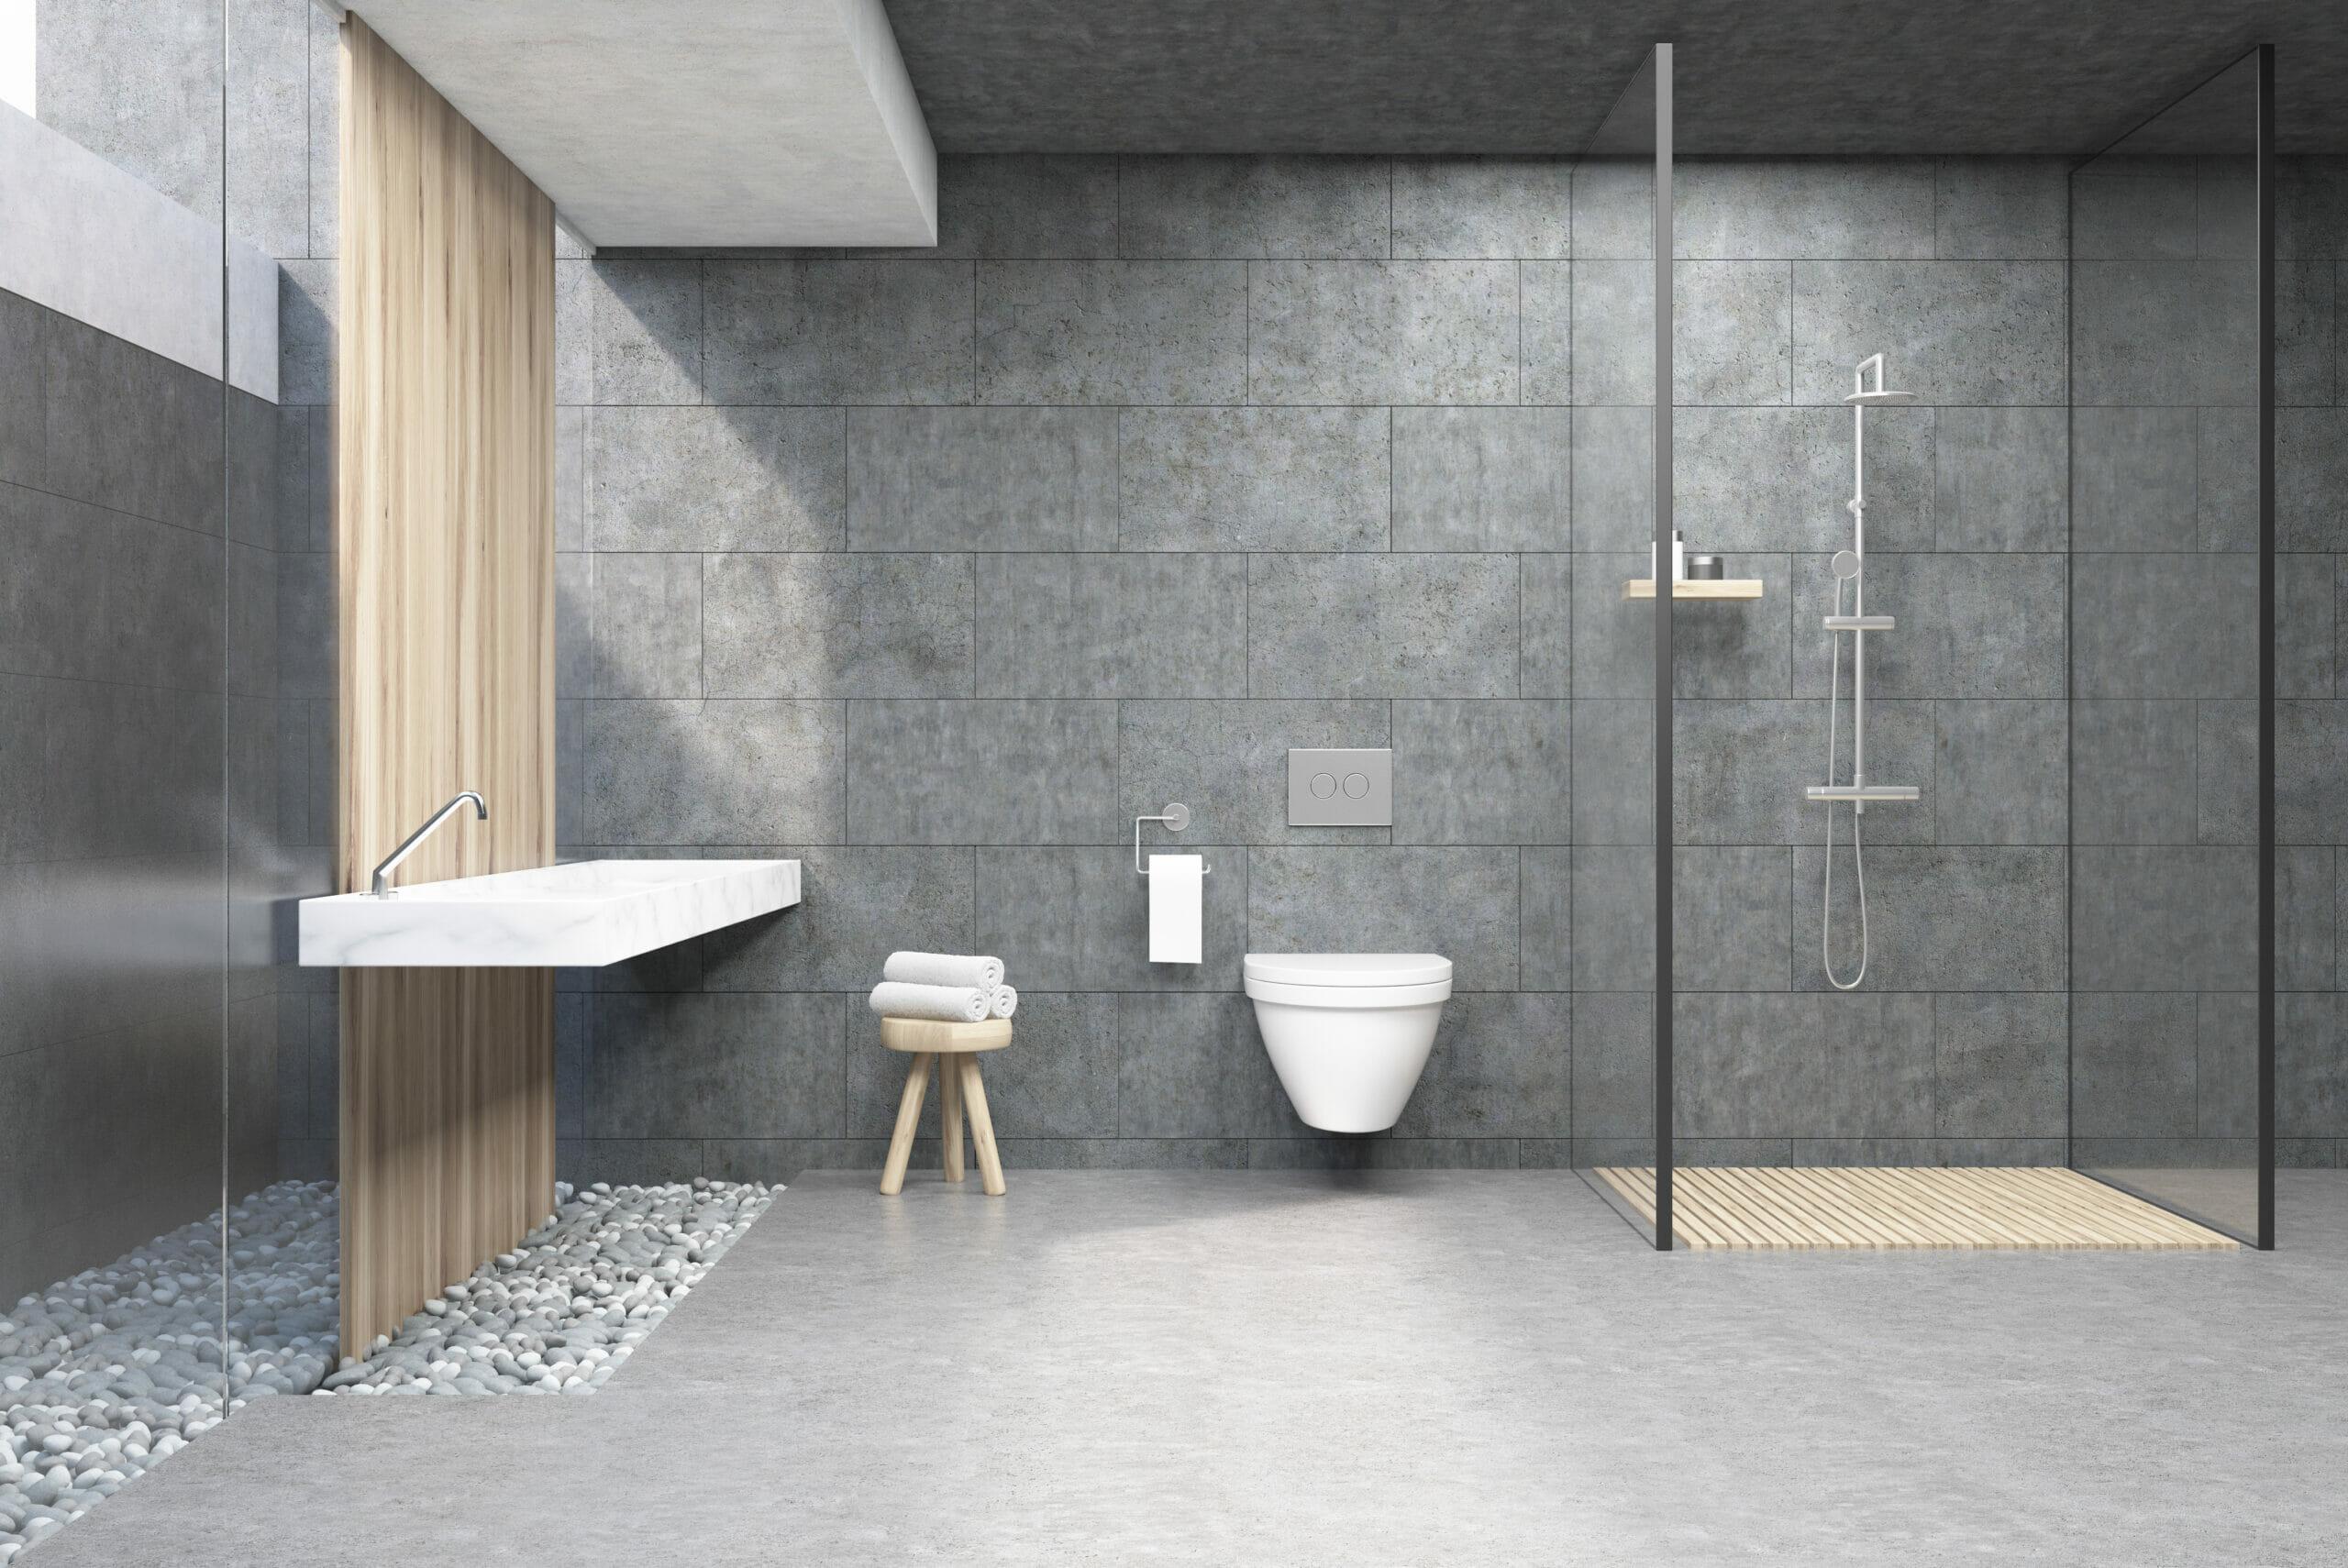 Badsanierung Ideen barrierefreie Dusche